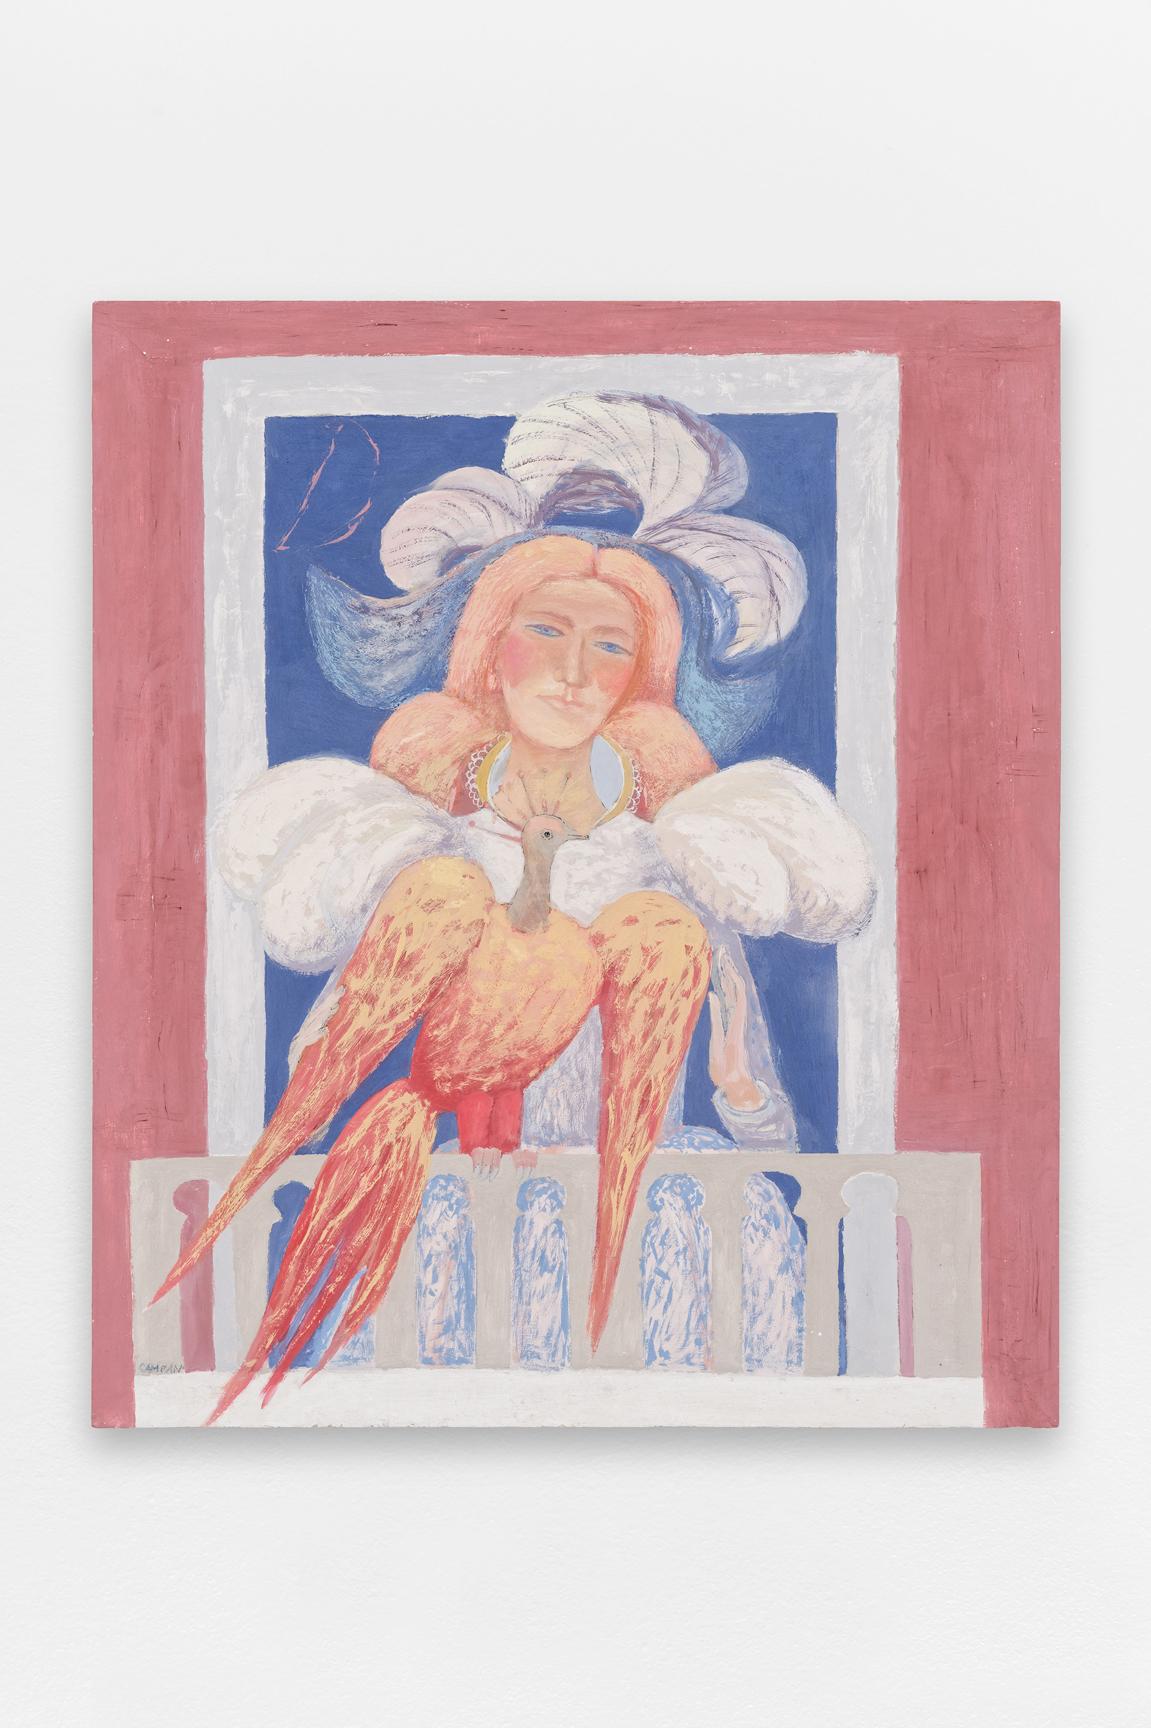 La lune, Venise et toi,  Sorin Câmpan, 2019, acrylic and gesso on board, 84 x 98 cm   — Galerie Éric Hussenot, Paris